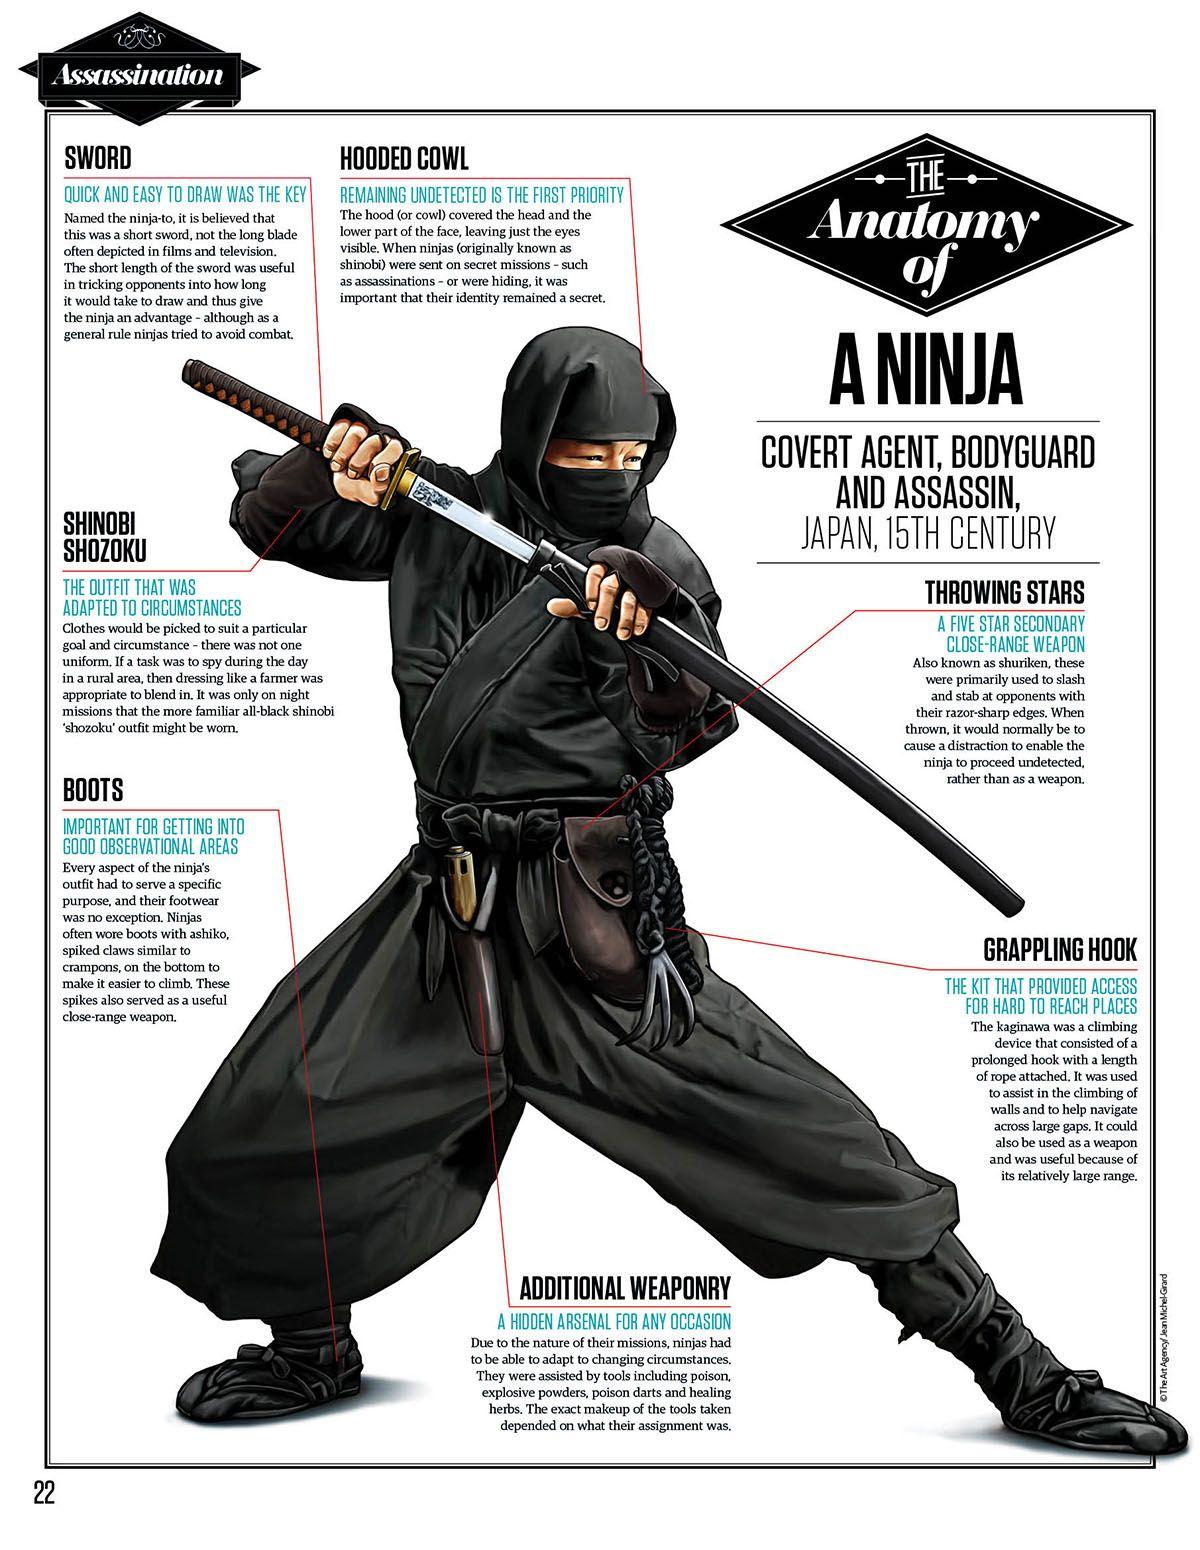 The Bestiarium: Ninjas